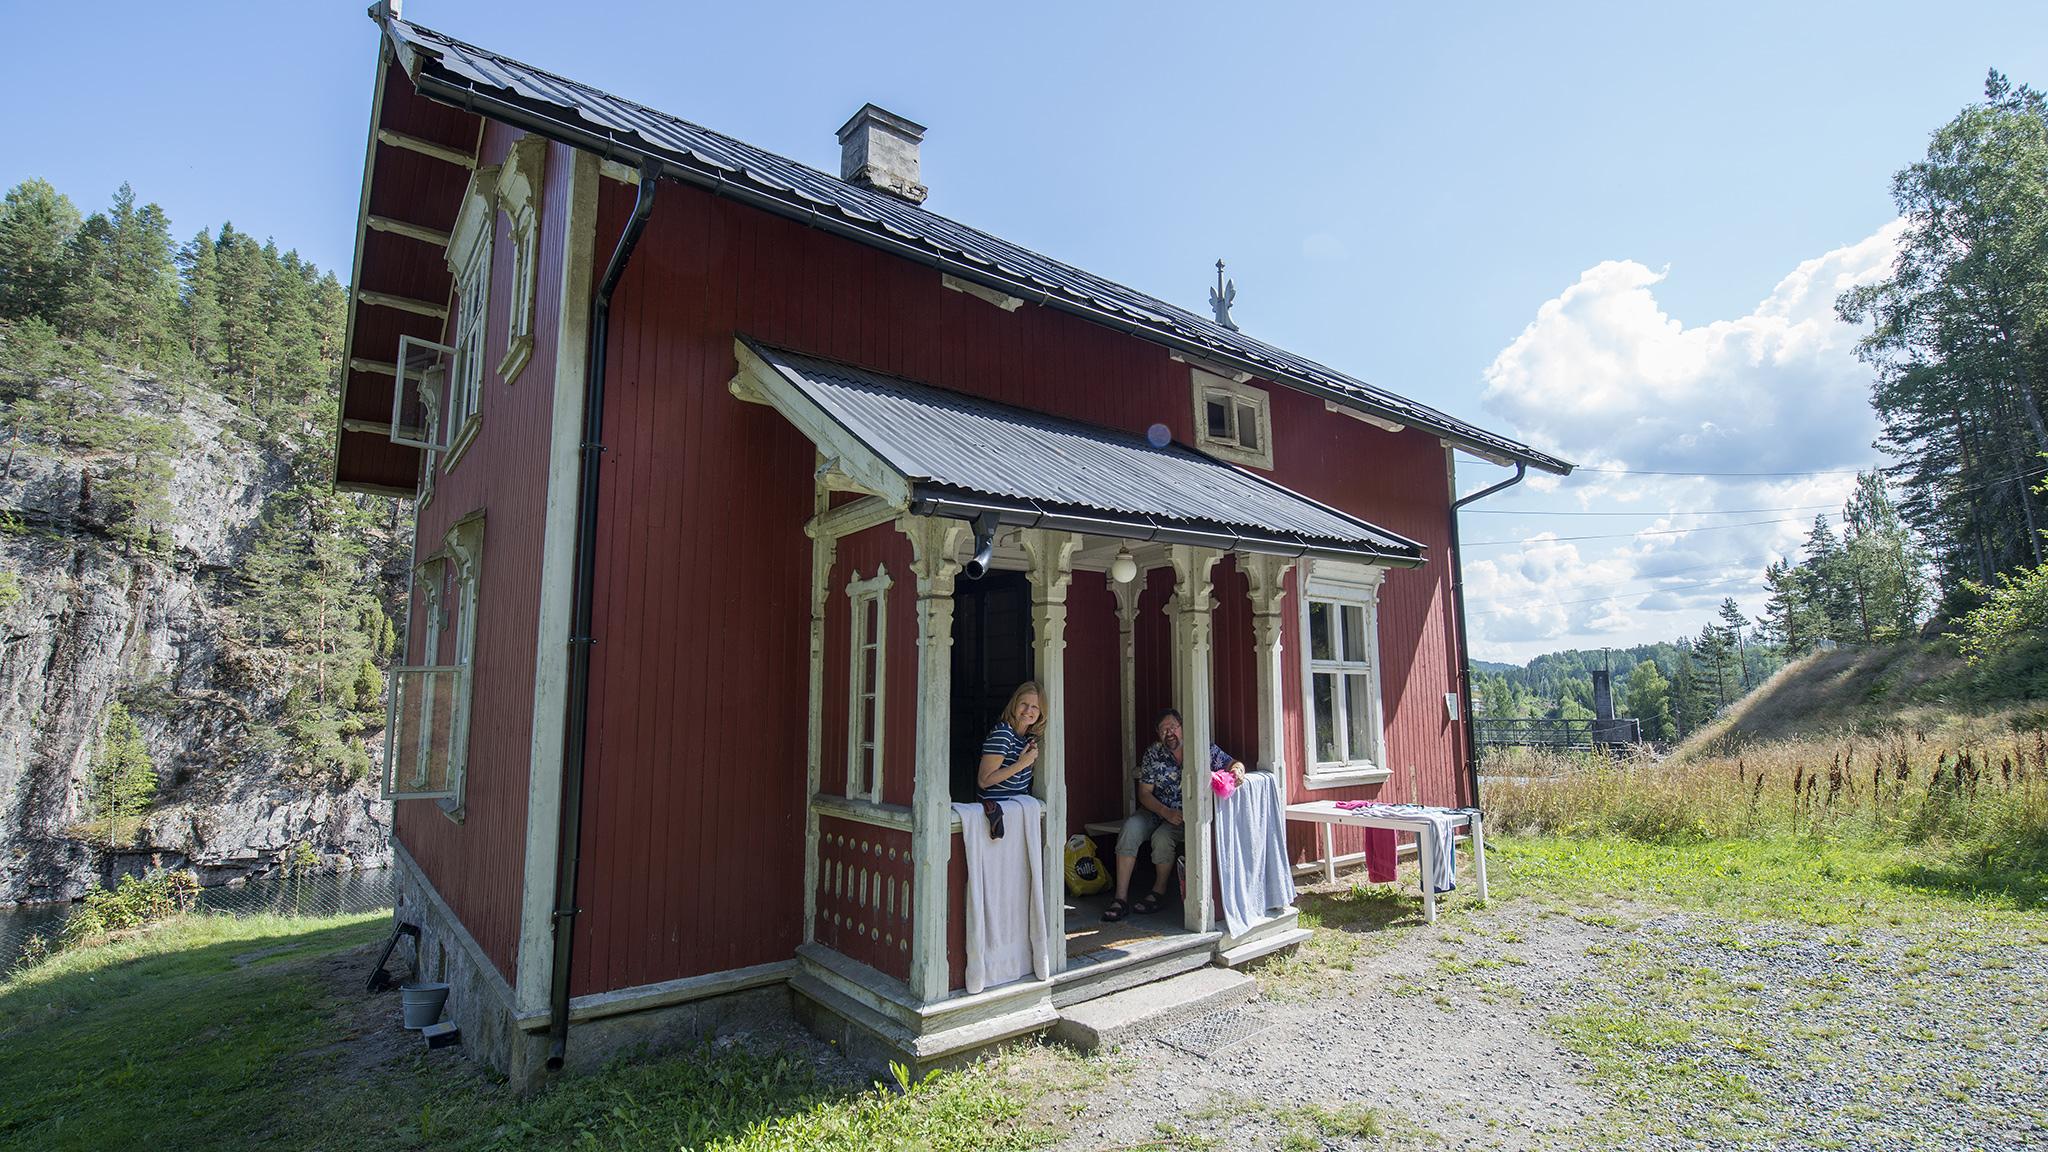 BO I VOKTERBOLIG: Sommergjestene koser seg i inngangspartiet på slusevokterboligen på Vrangfoss.